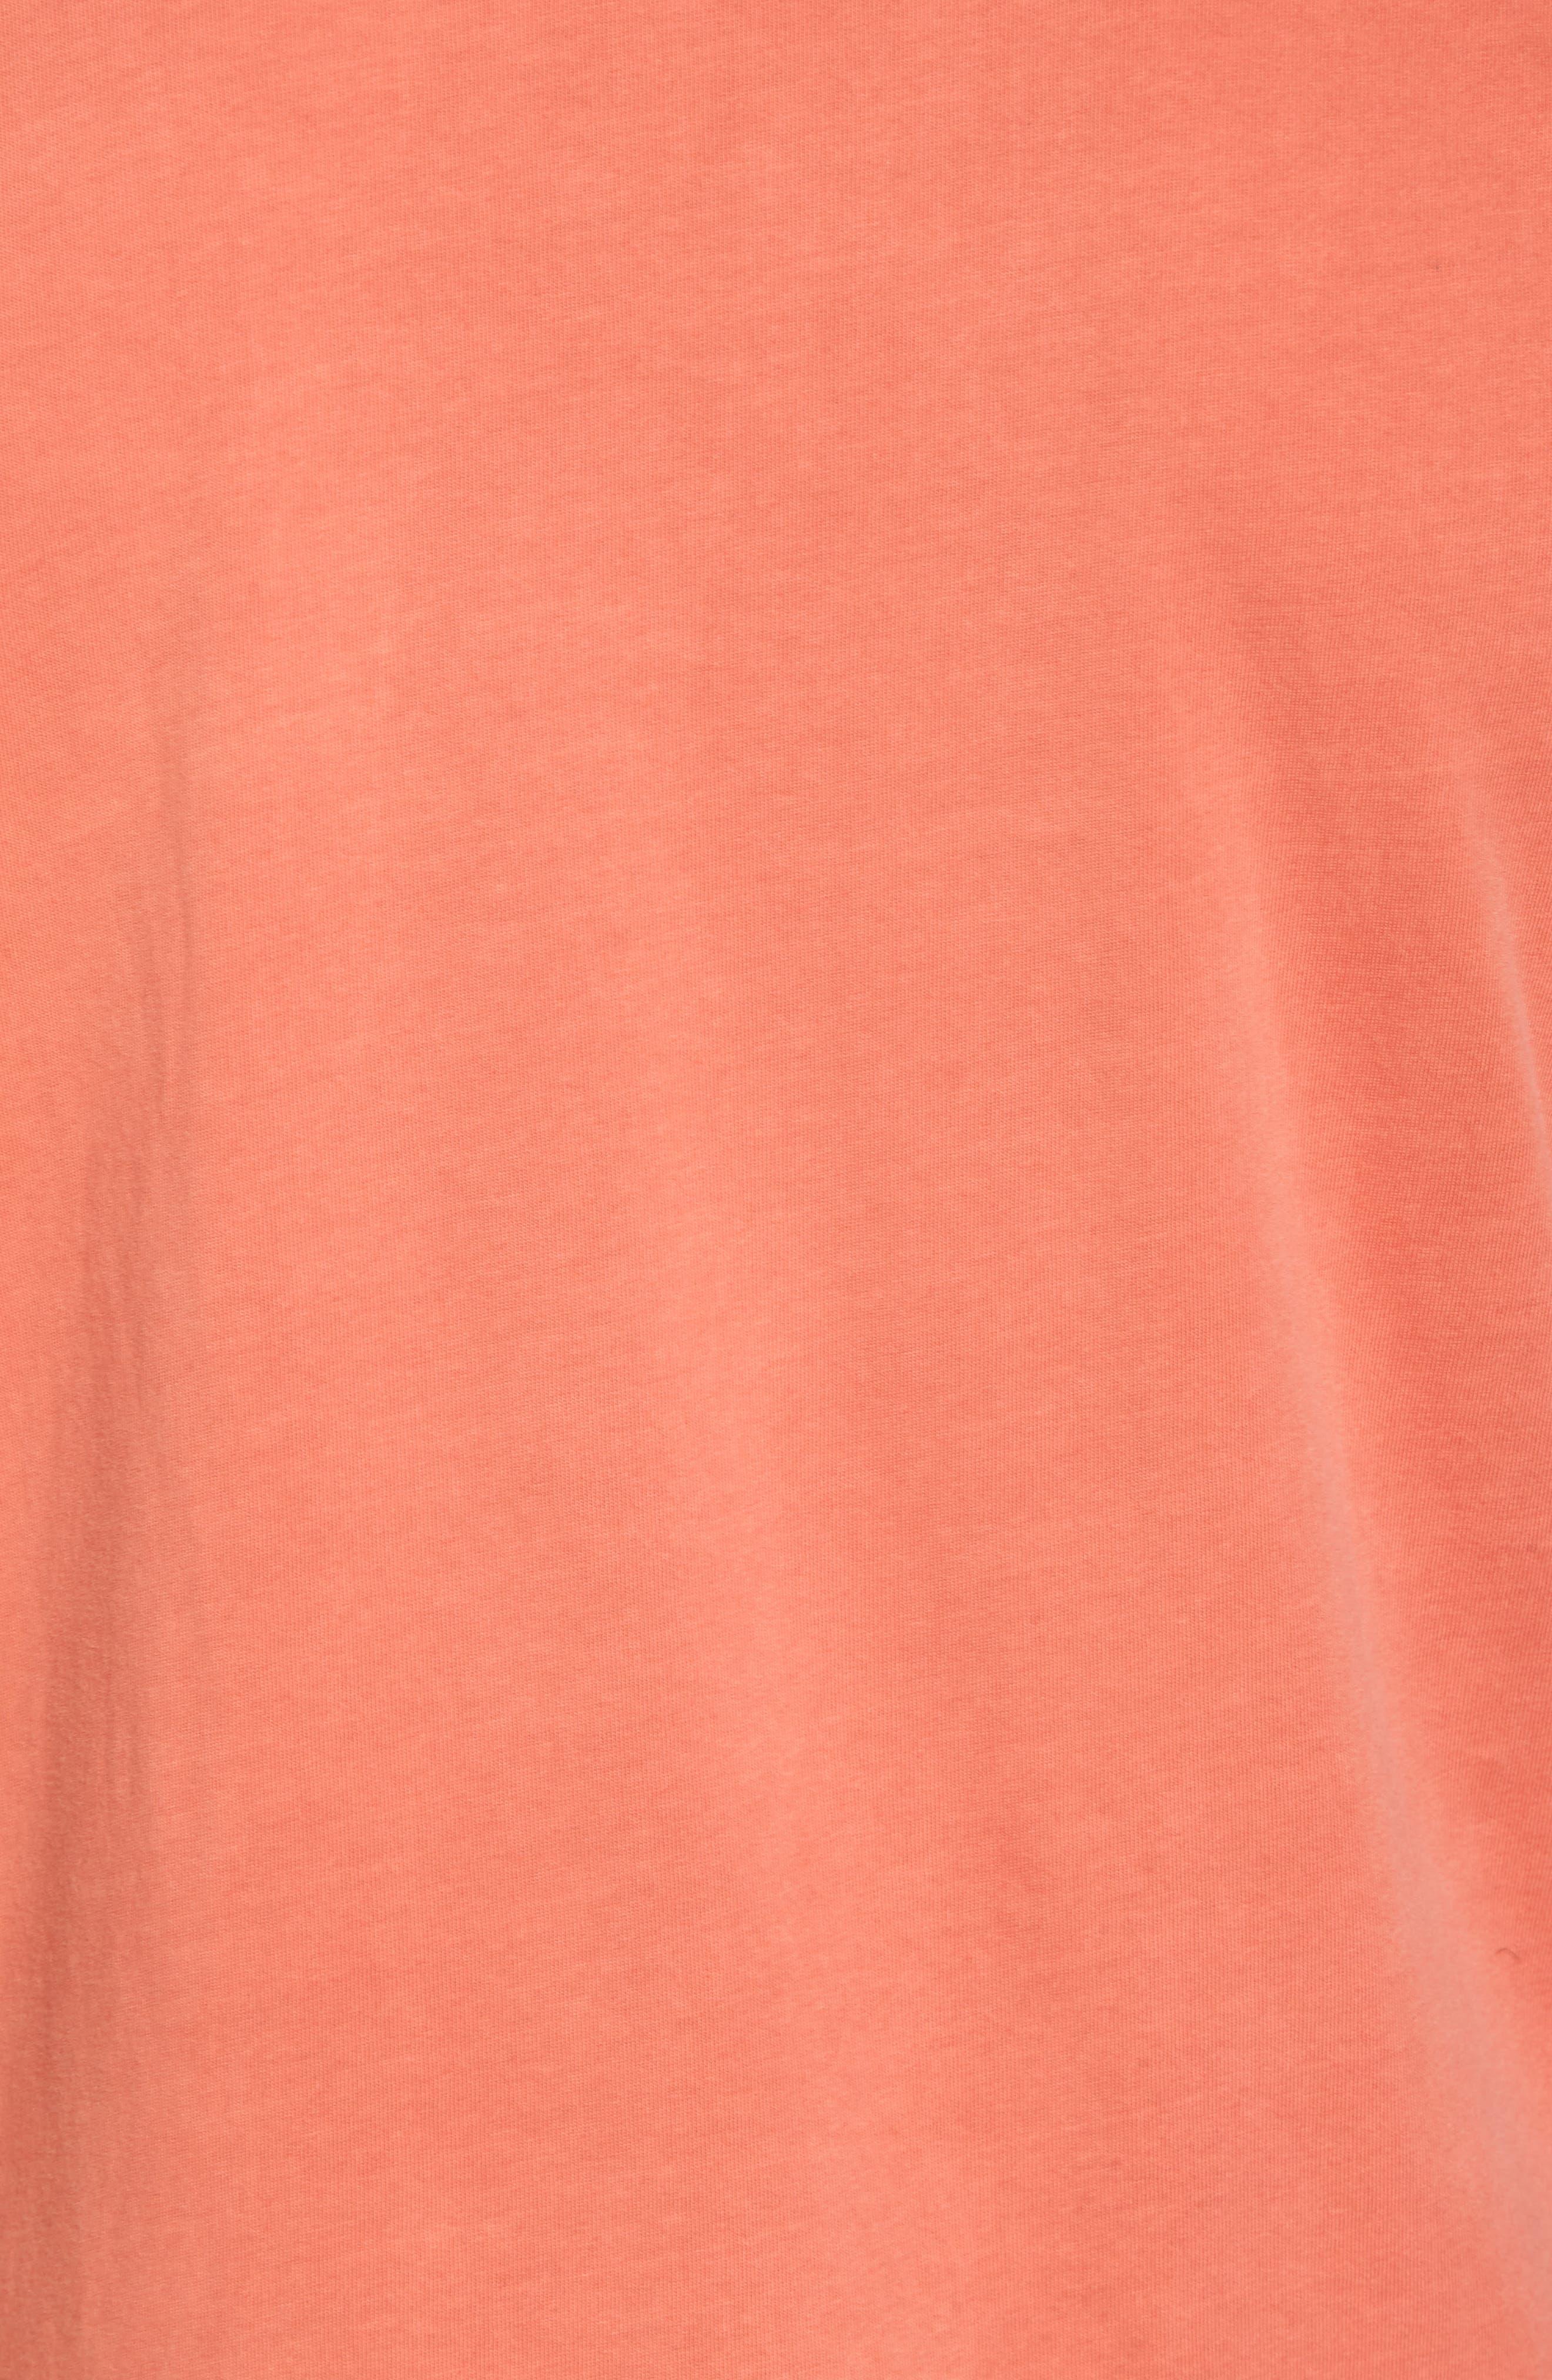 Dominance Graphic T-Shirt,                             Alternate thumbnail 5, color,